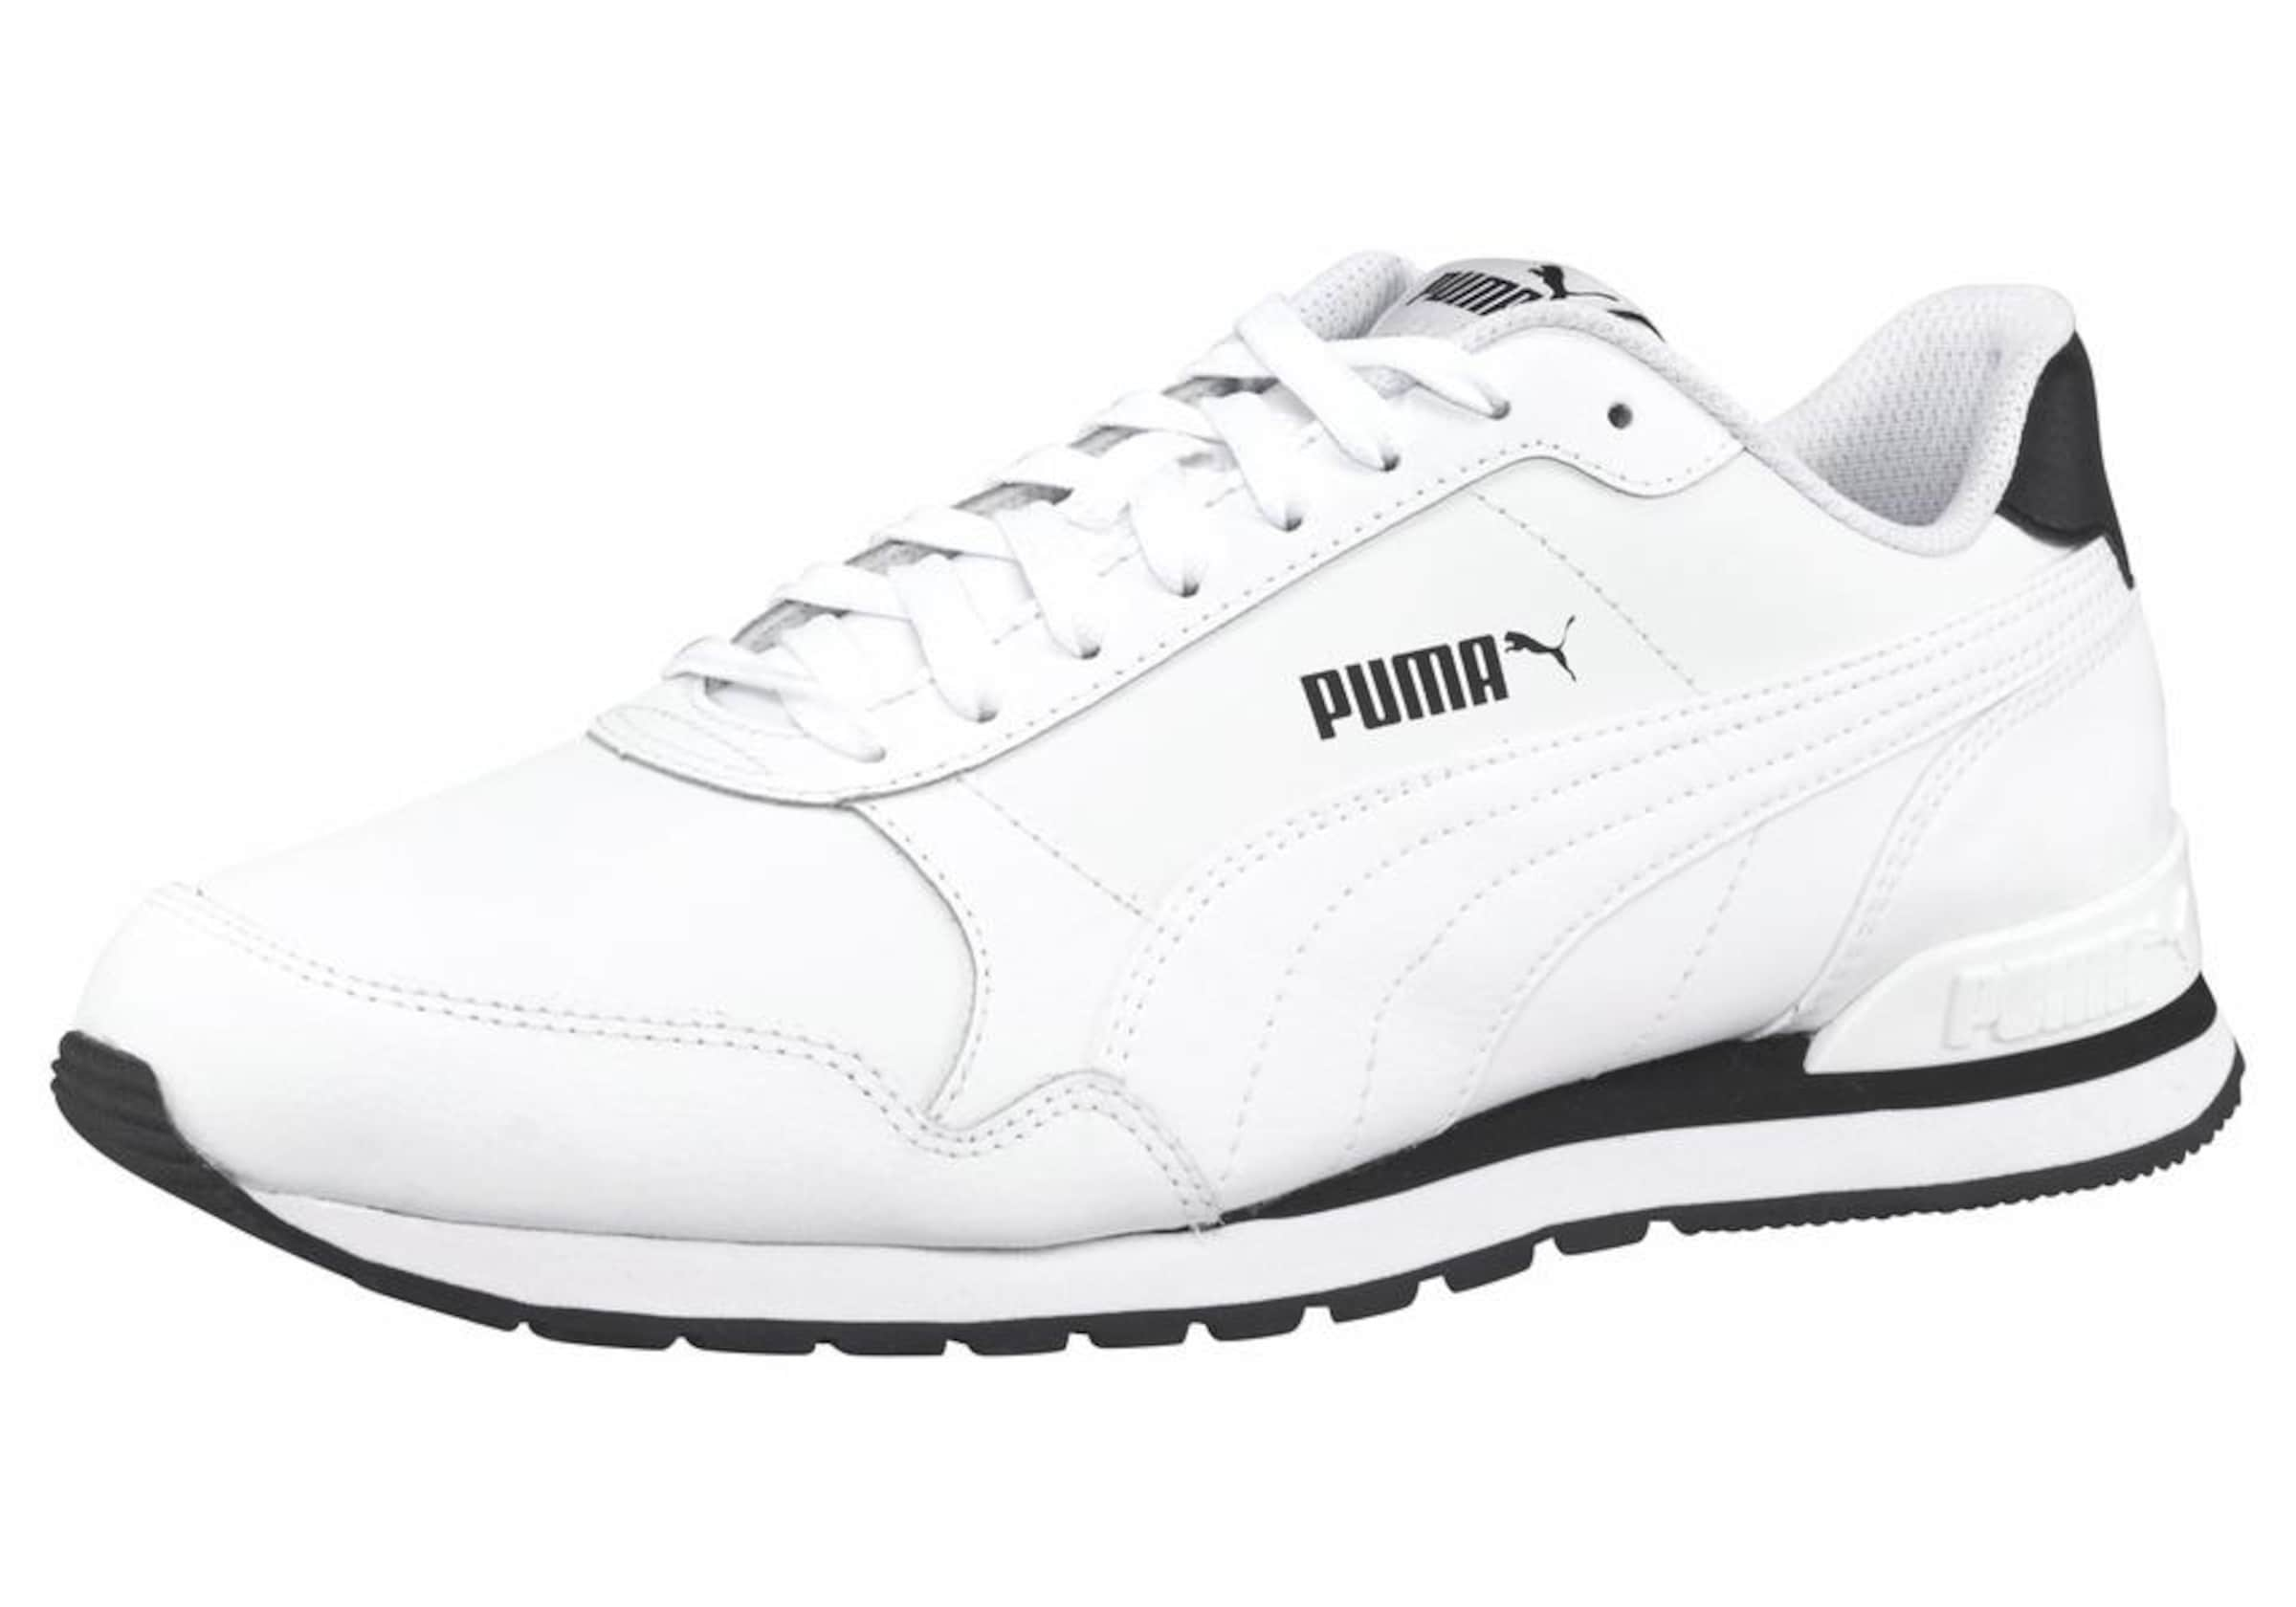 PUMA v2 | Turnschuhe ST Runner v2 PUMA Full Leather d00b5e